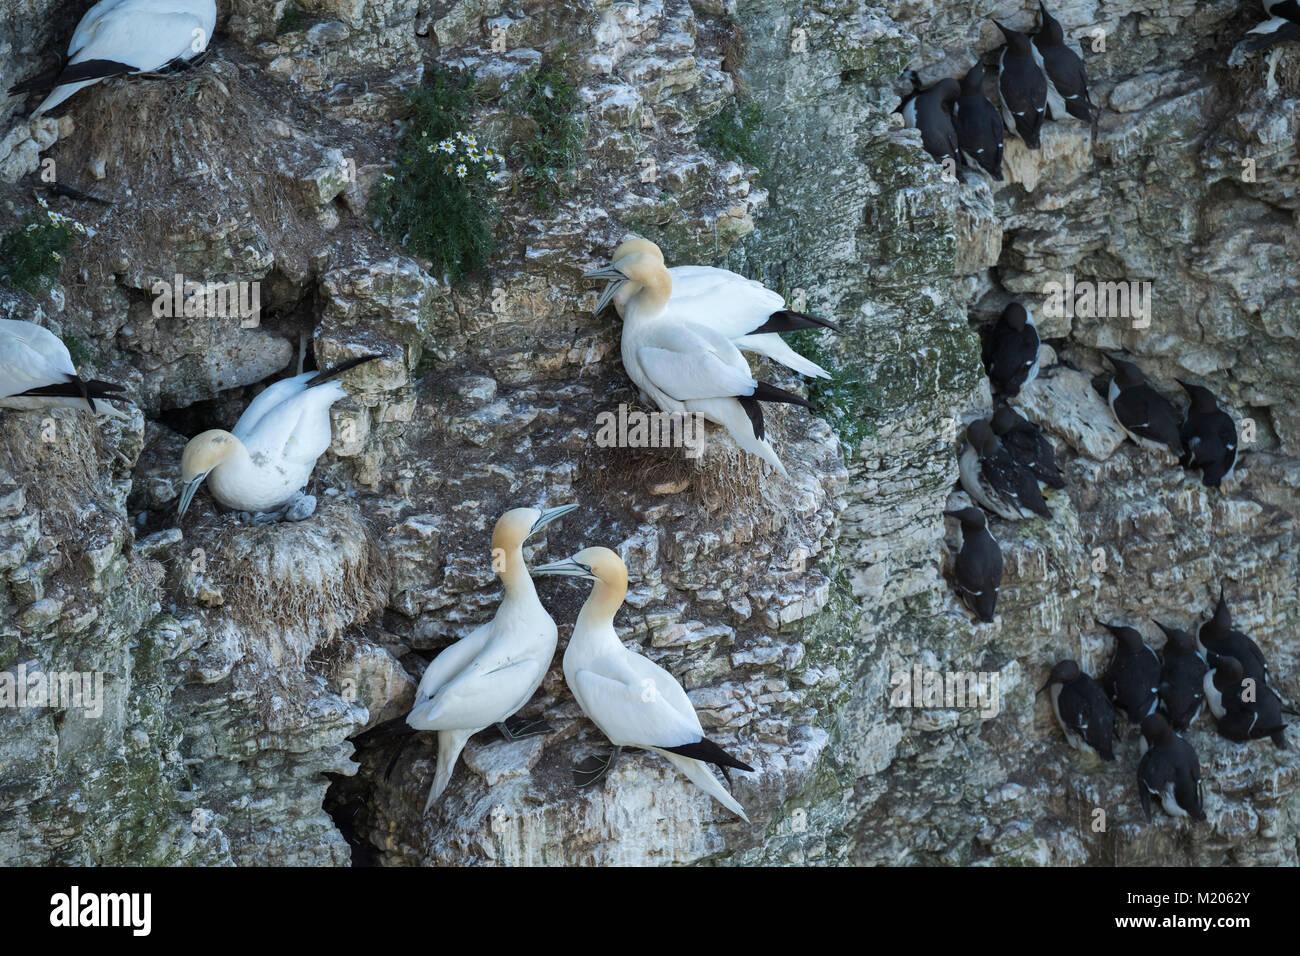 Hohe Aussicht close-up von Seevögeln nisten (tölpel & Alke) auf felsigen Kreidefelsen - Seite Nester Stockbild